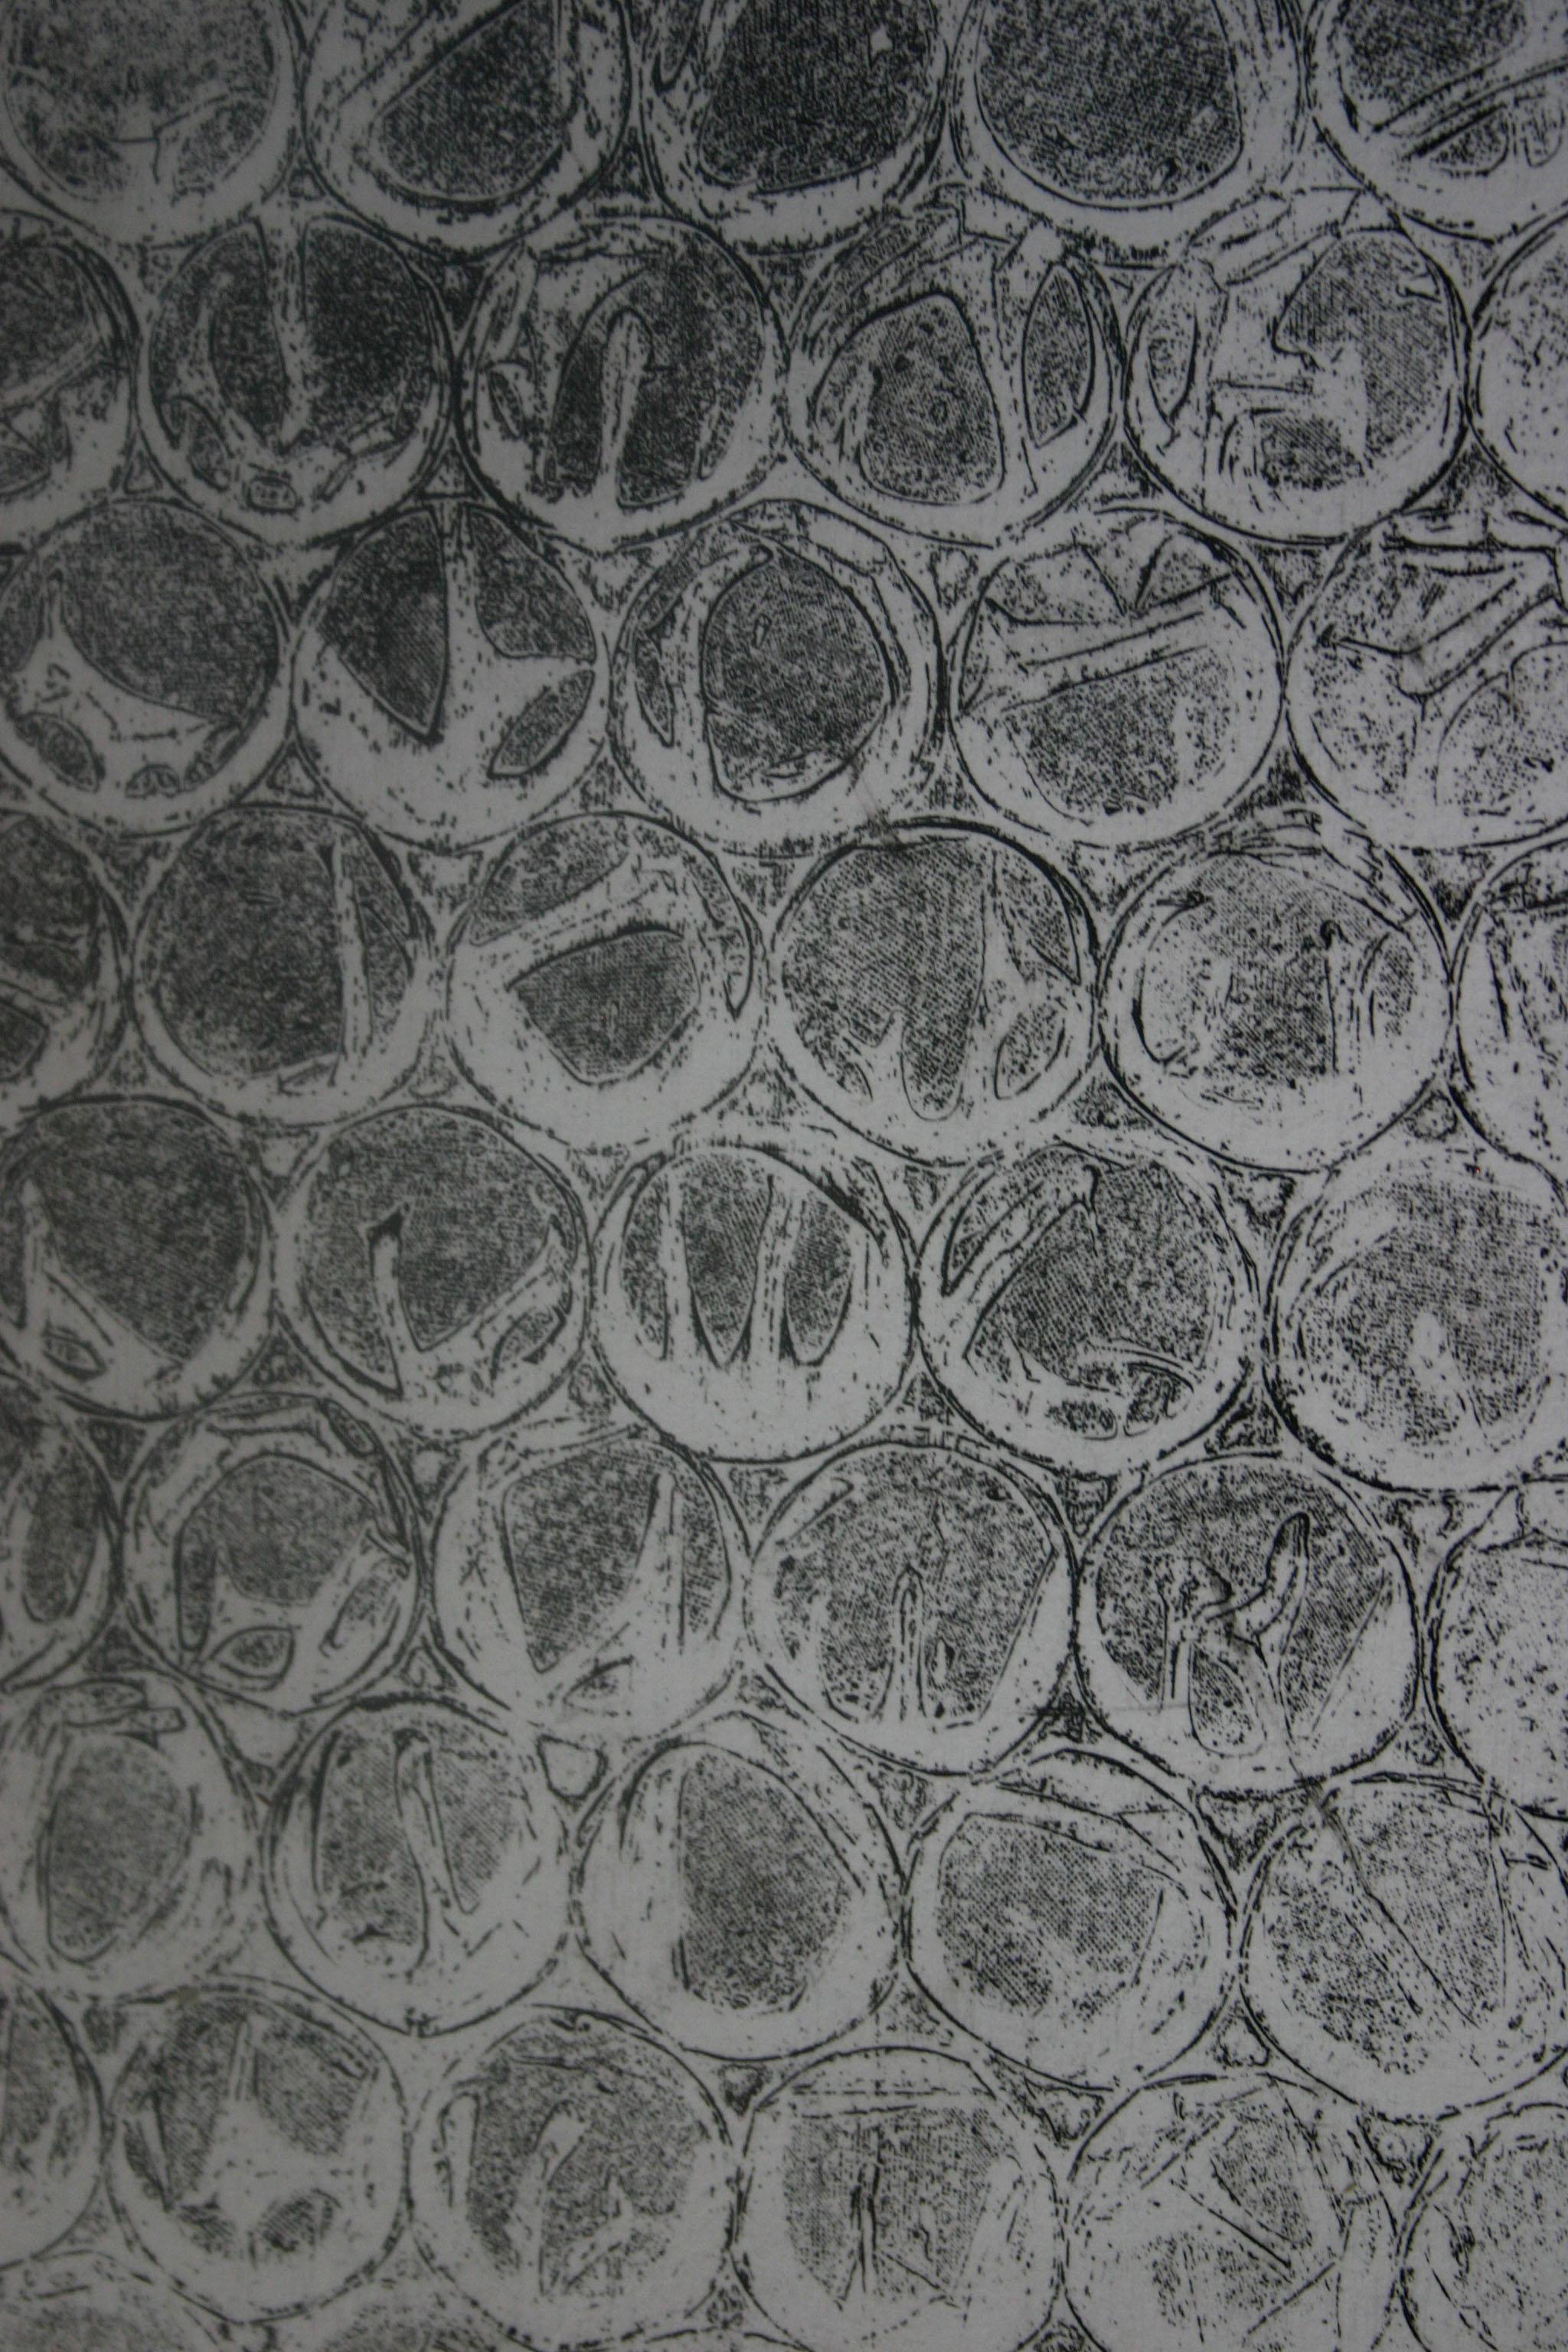 DETAIL OF BUBBLEWRAP ETCHING